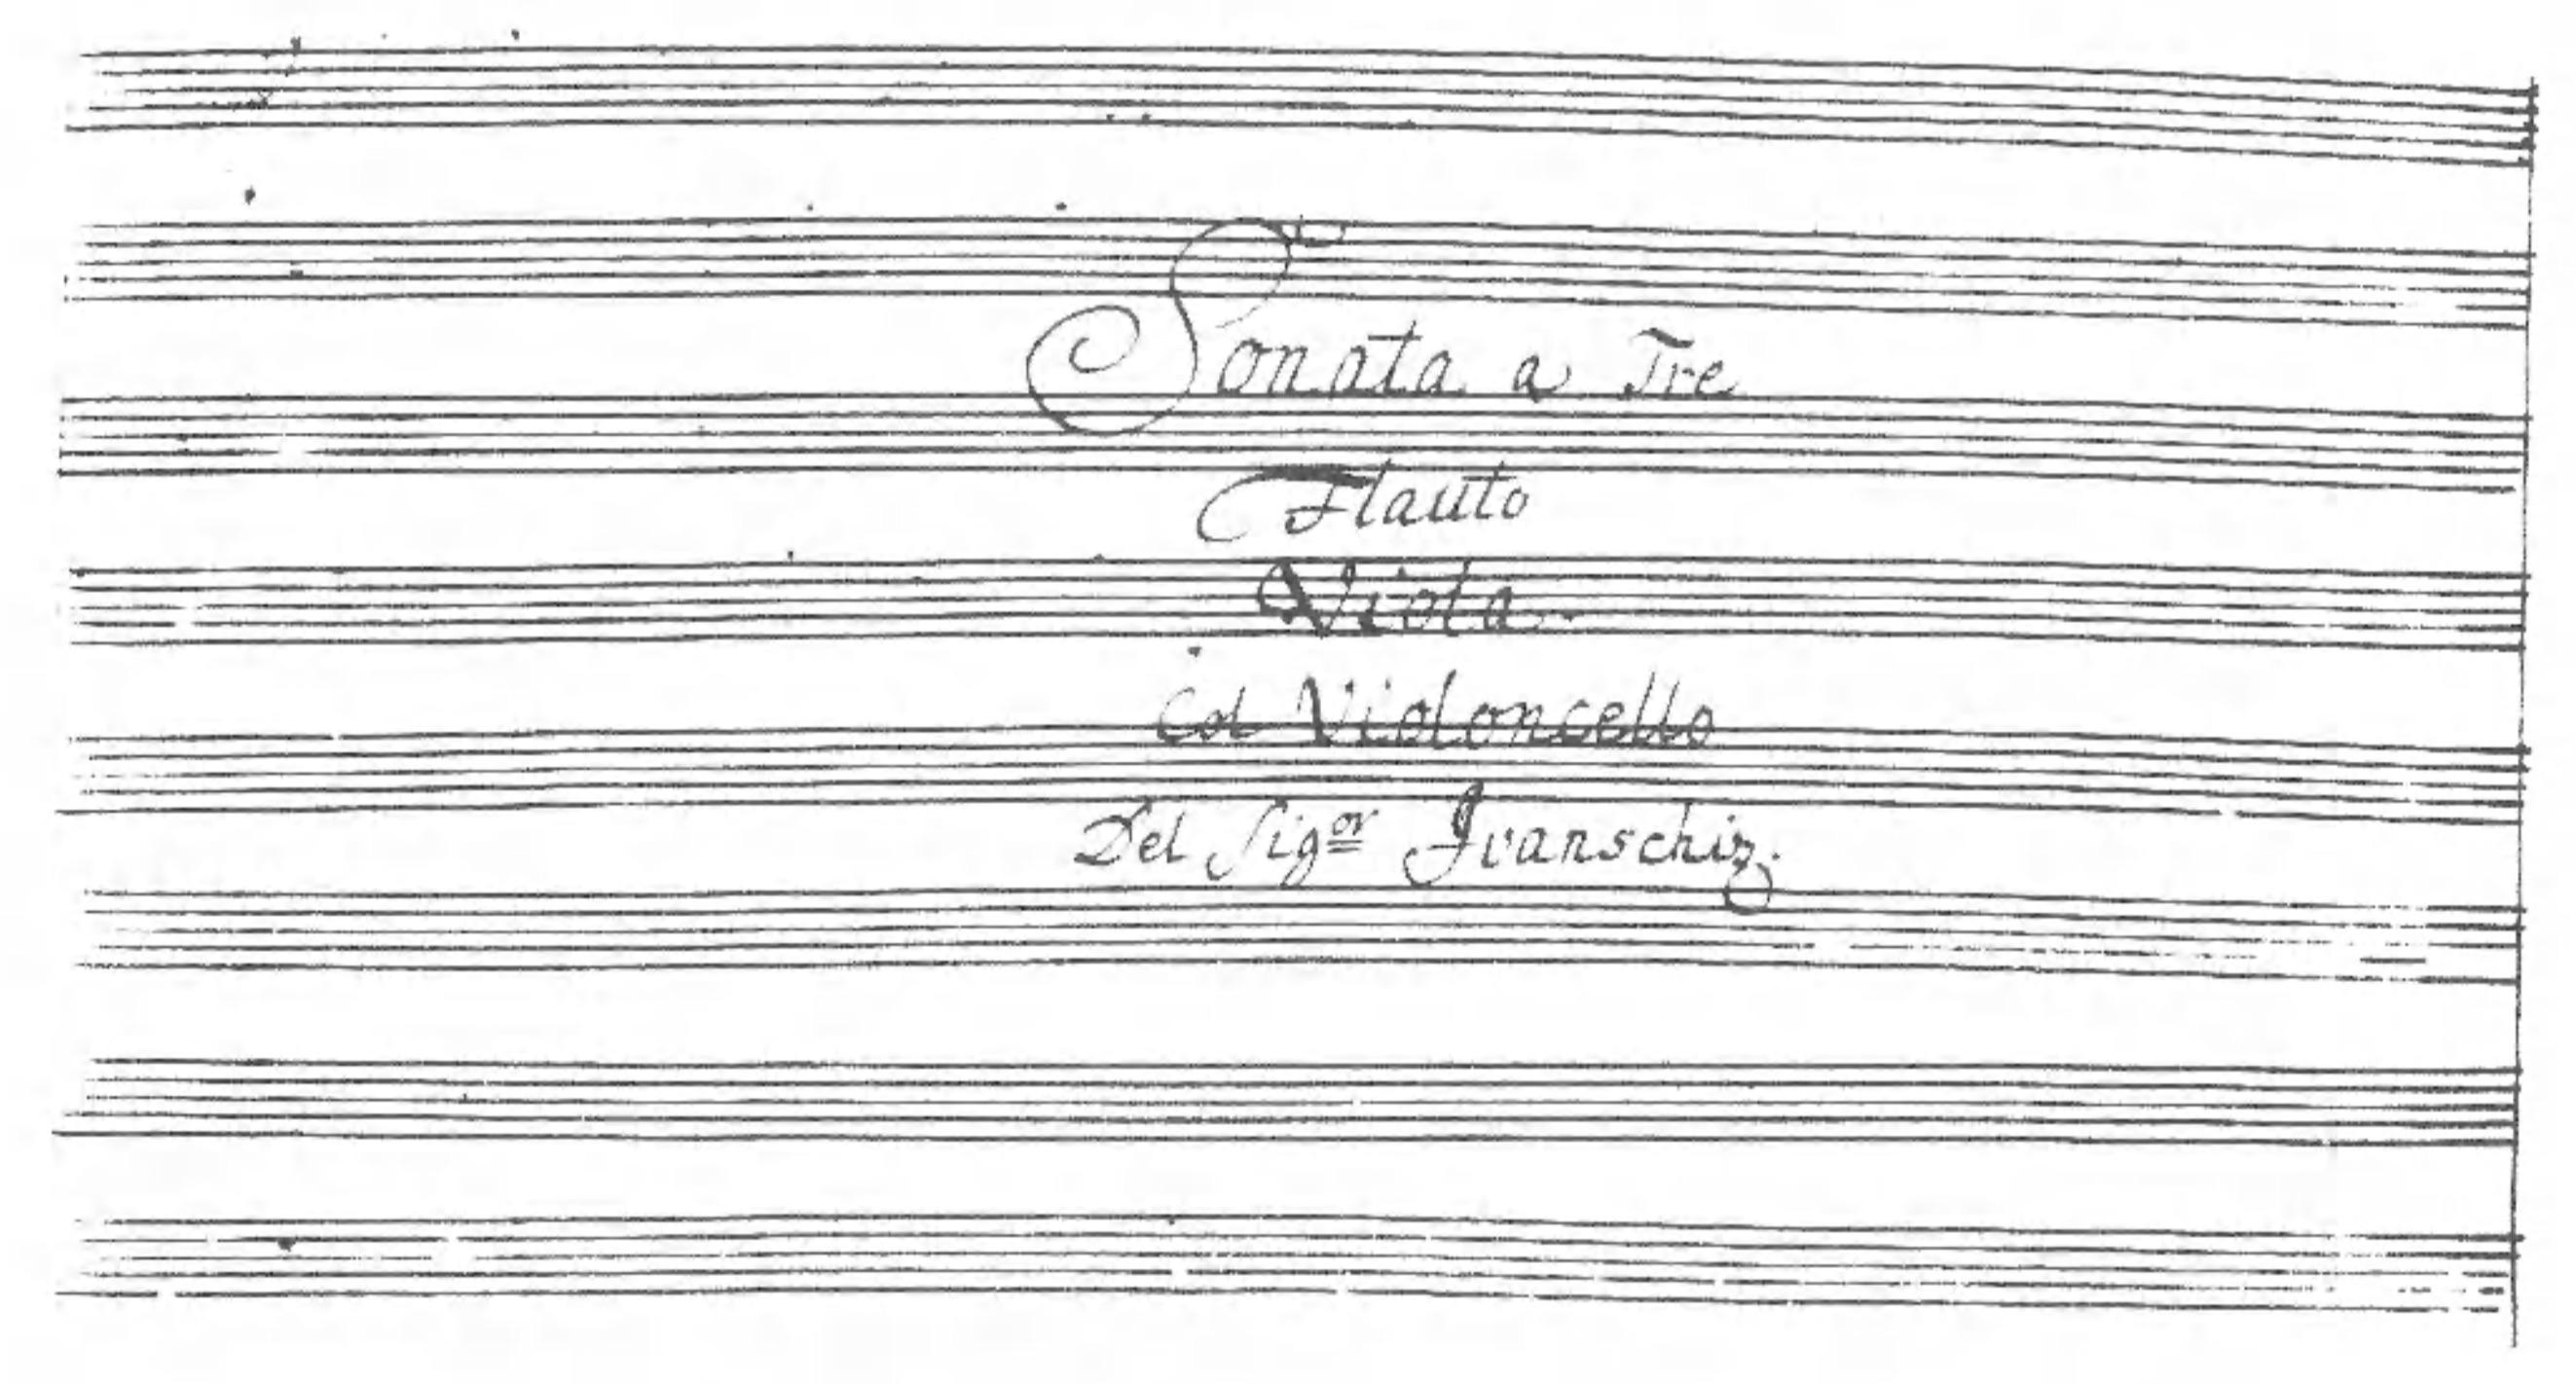 Title page of the Sonata a tre in G major (IV). Badische Landesbibliothek                   Karlsruhe, Ms. 225.